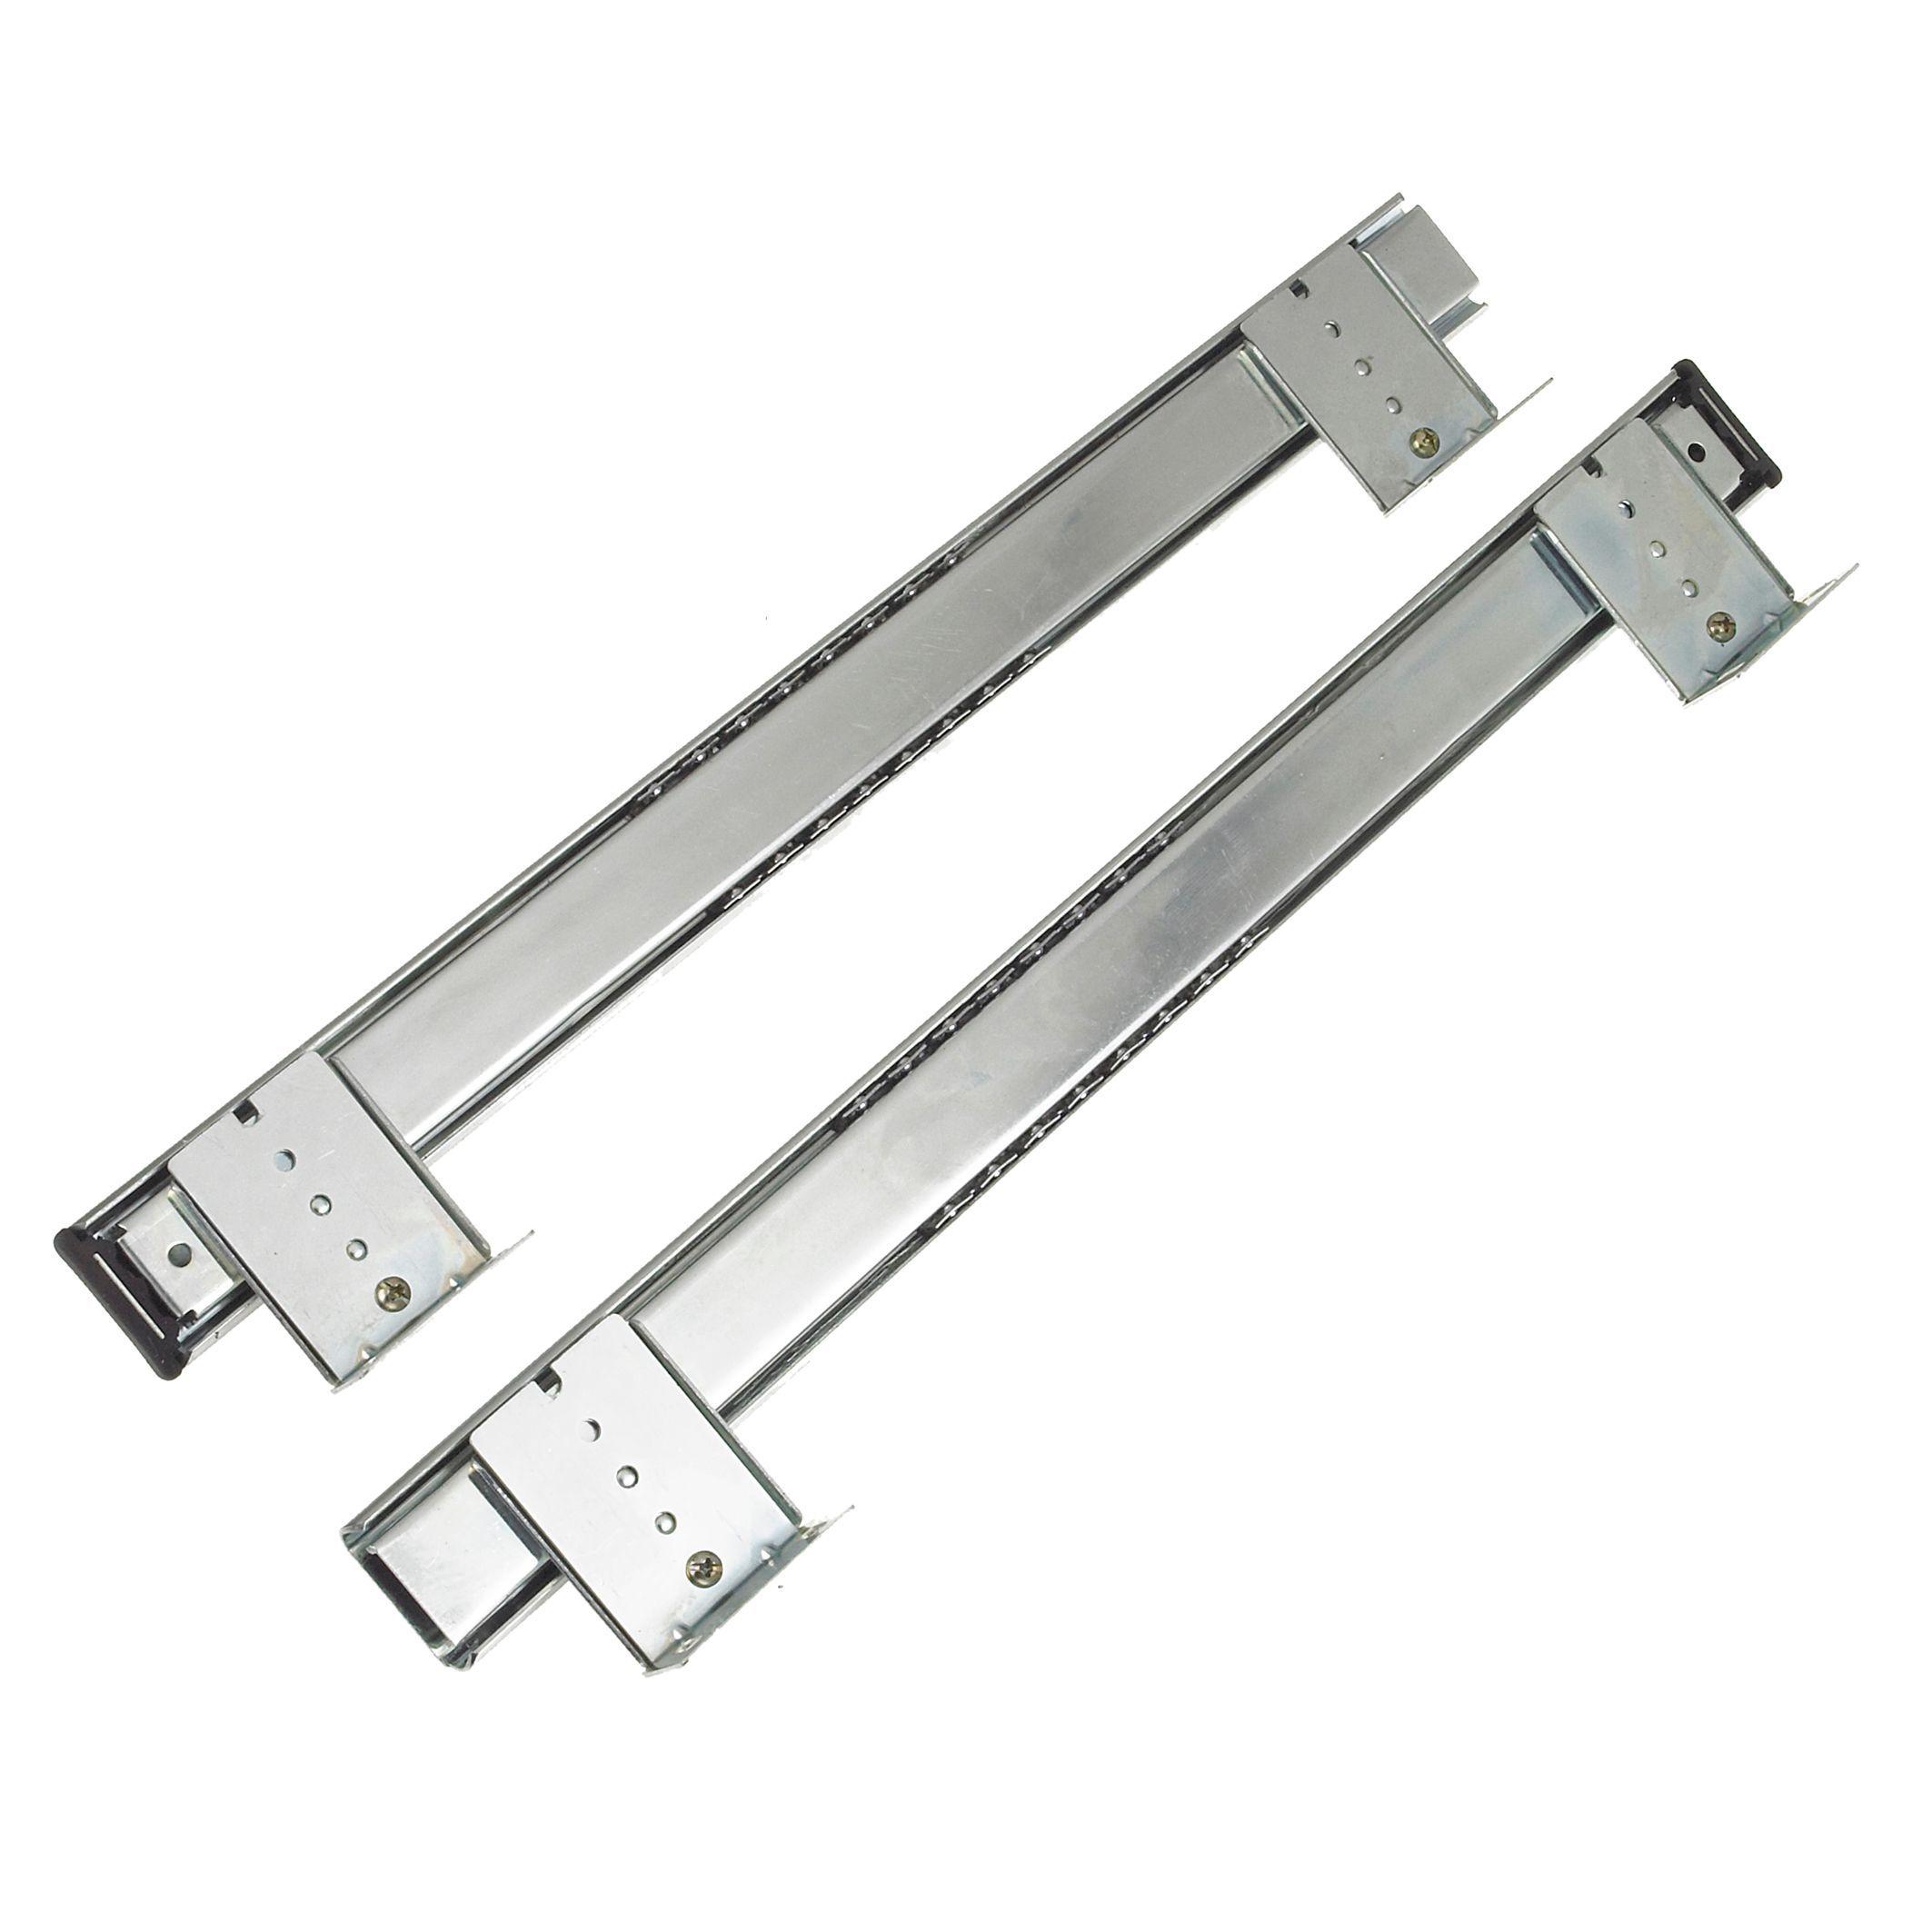 mount bearing door hanging drawers ball x measurements full slides extension heavy design kav within drawer bottom duty